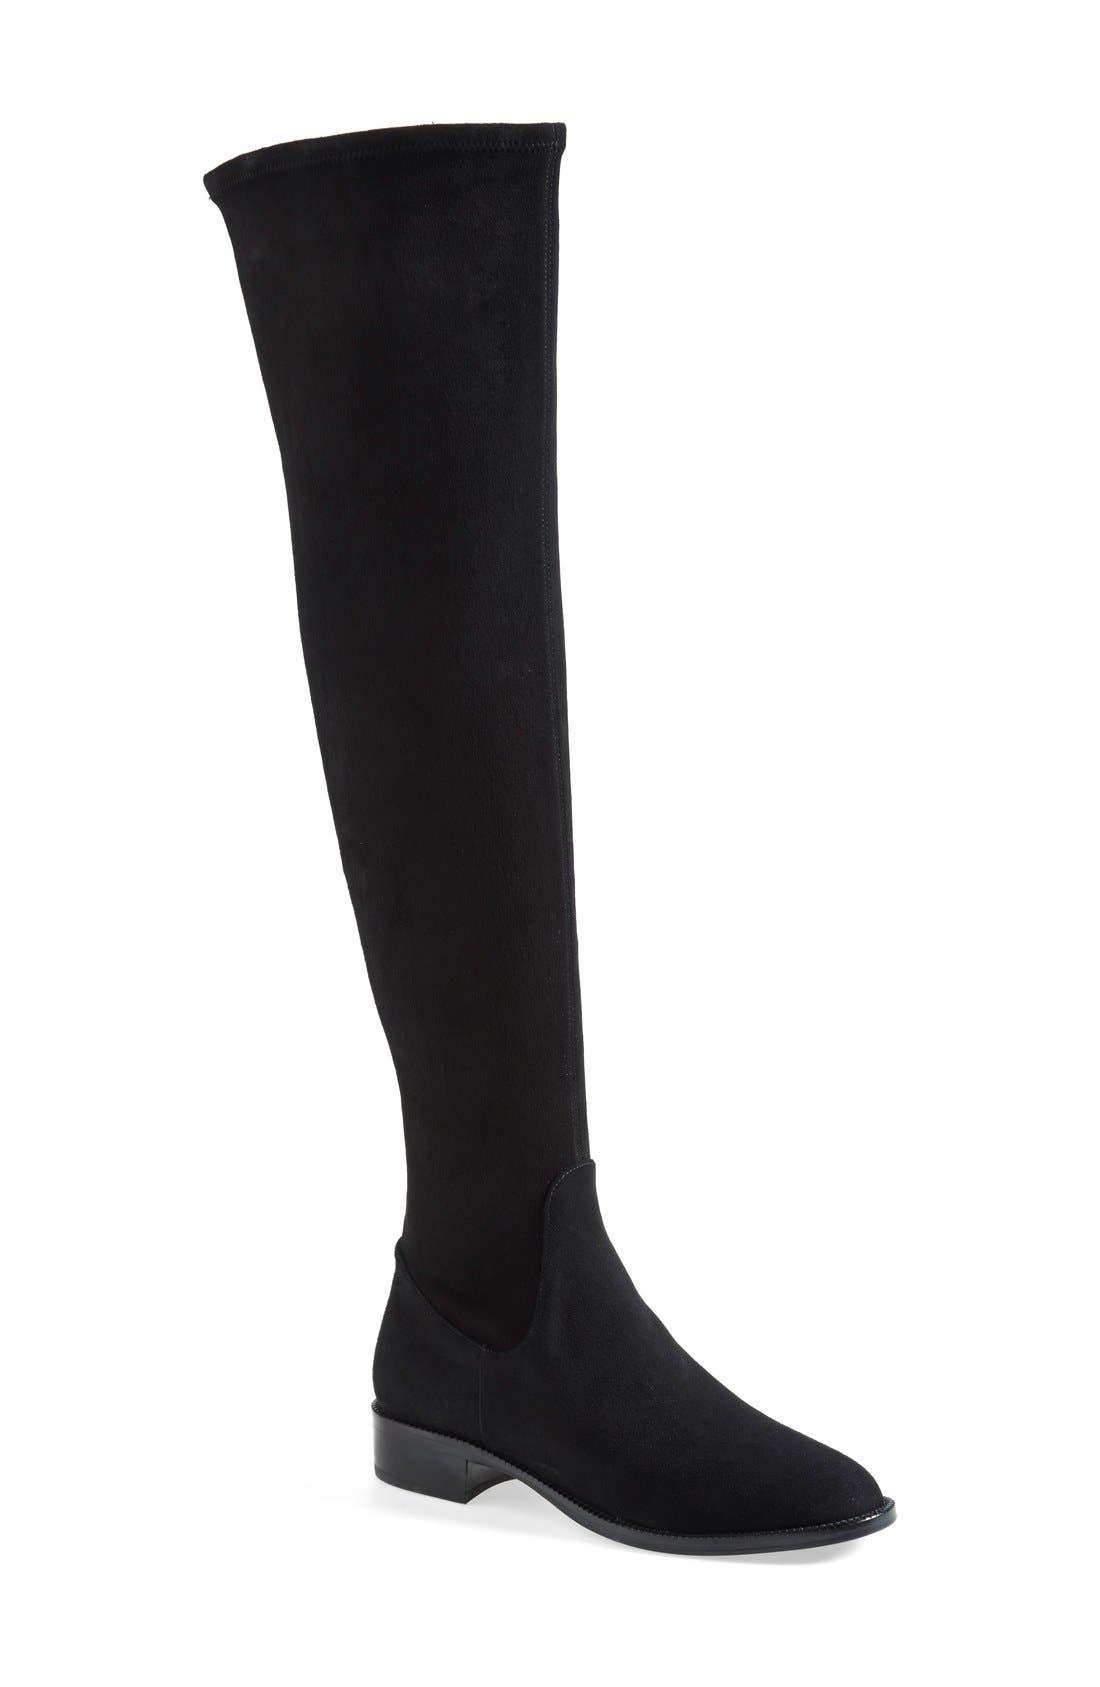 Alternate Image 1 Selected - Via Spiga 'Boni' Over the Knee Boot (Women)